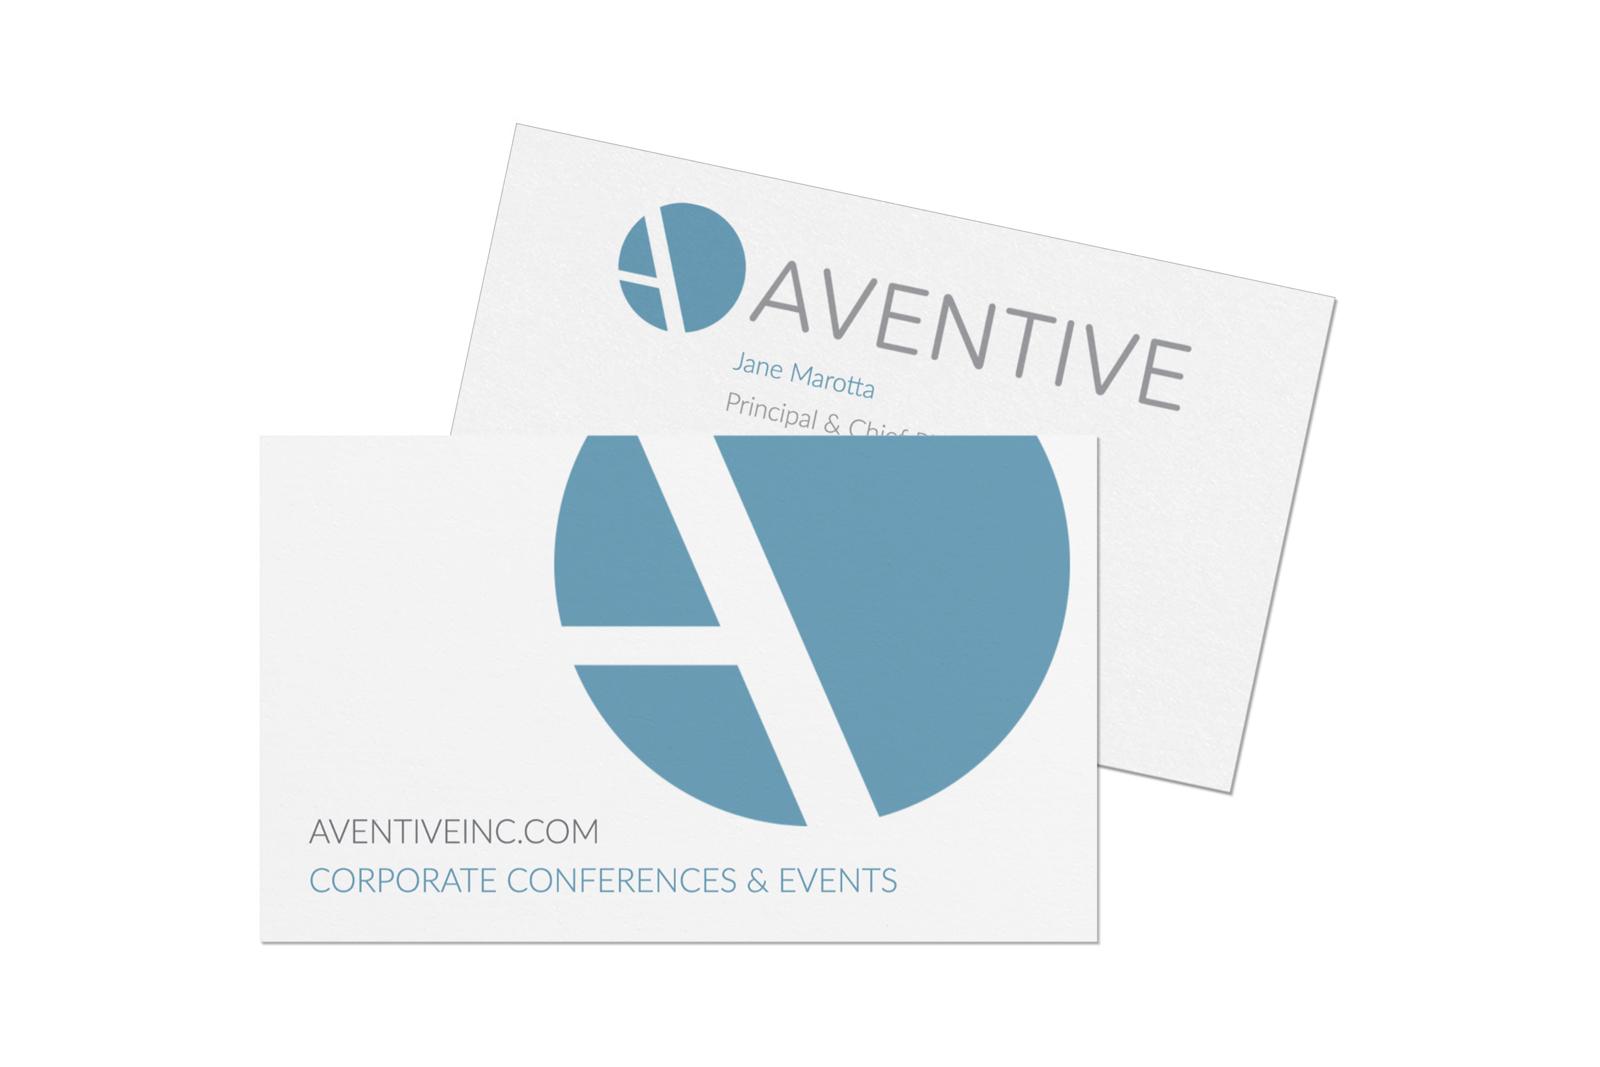 Aventive Business Card